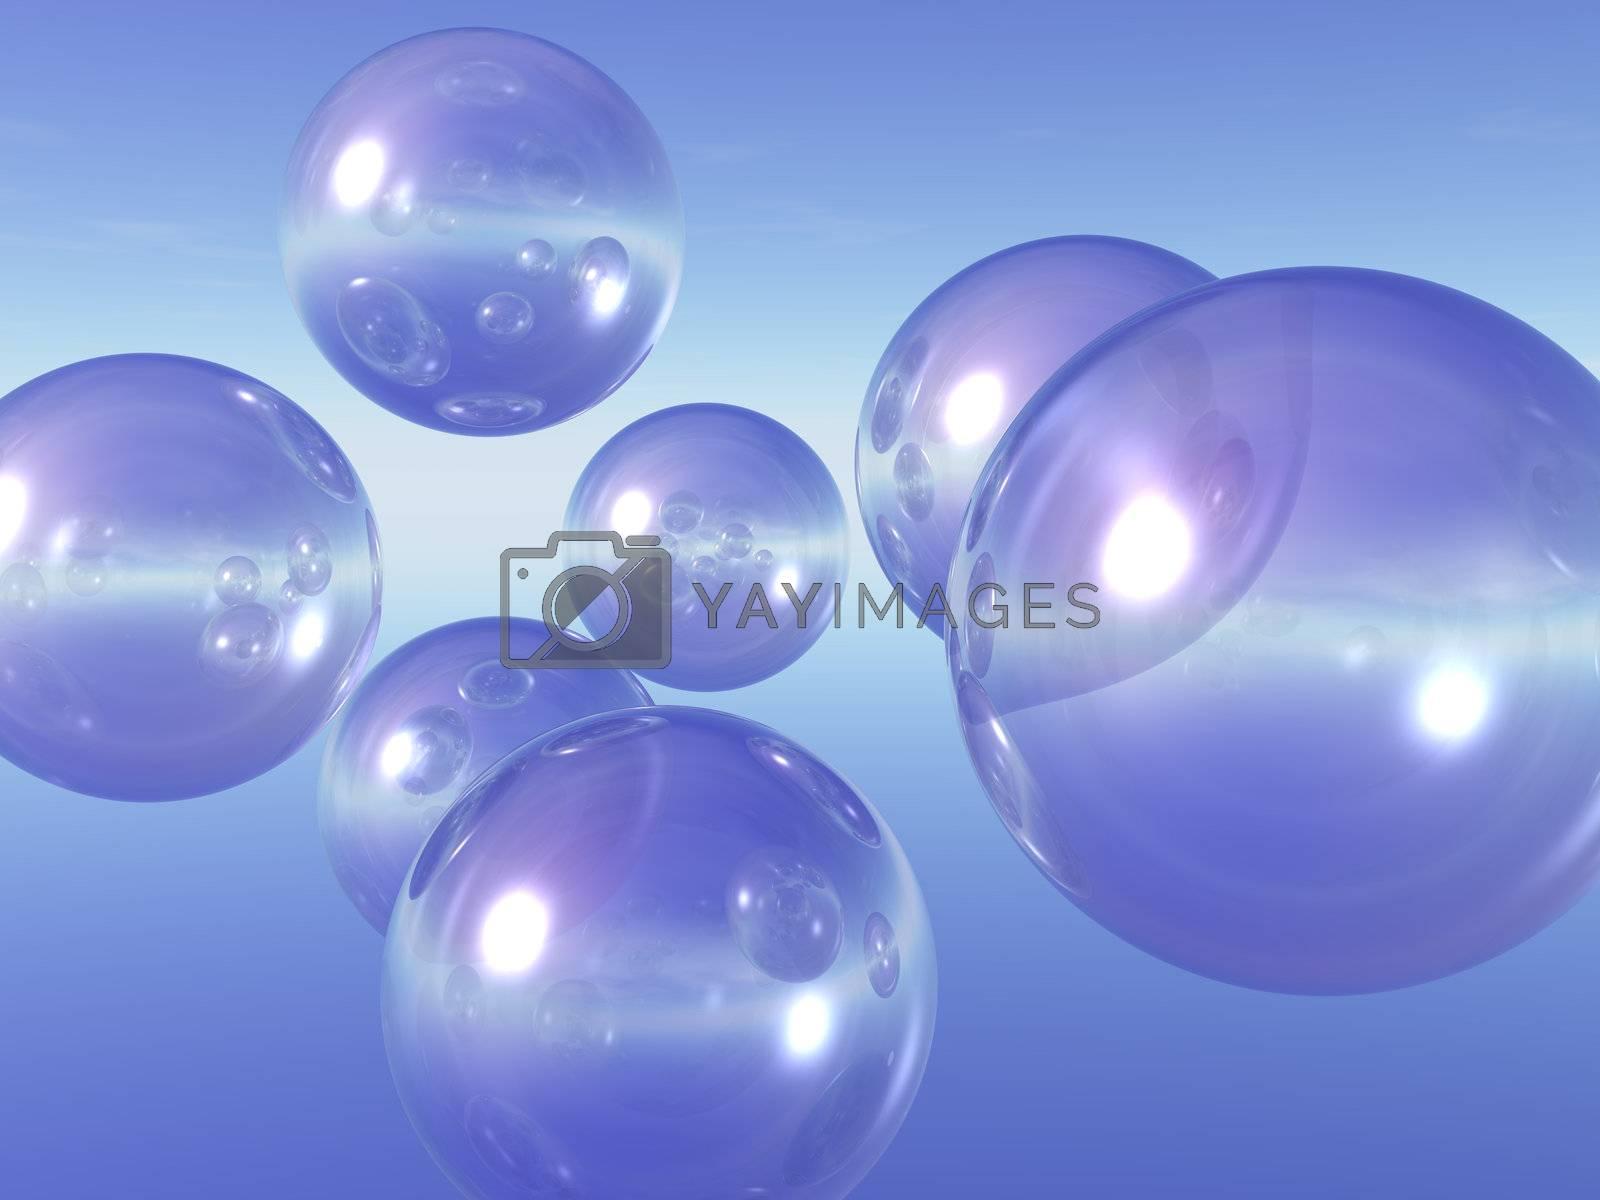 transparent glass balls in the blue sky - 3d illustration